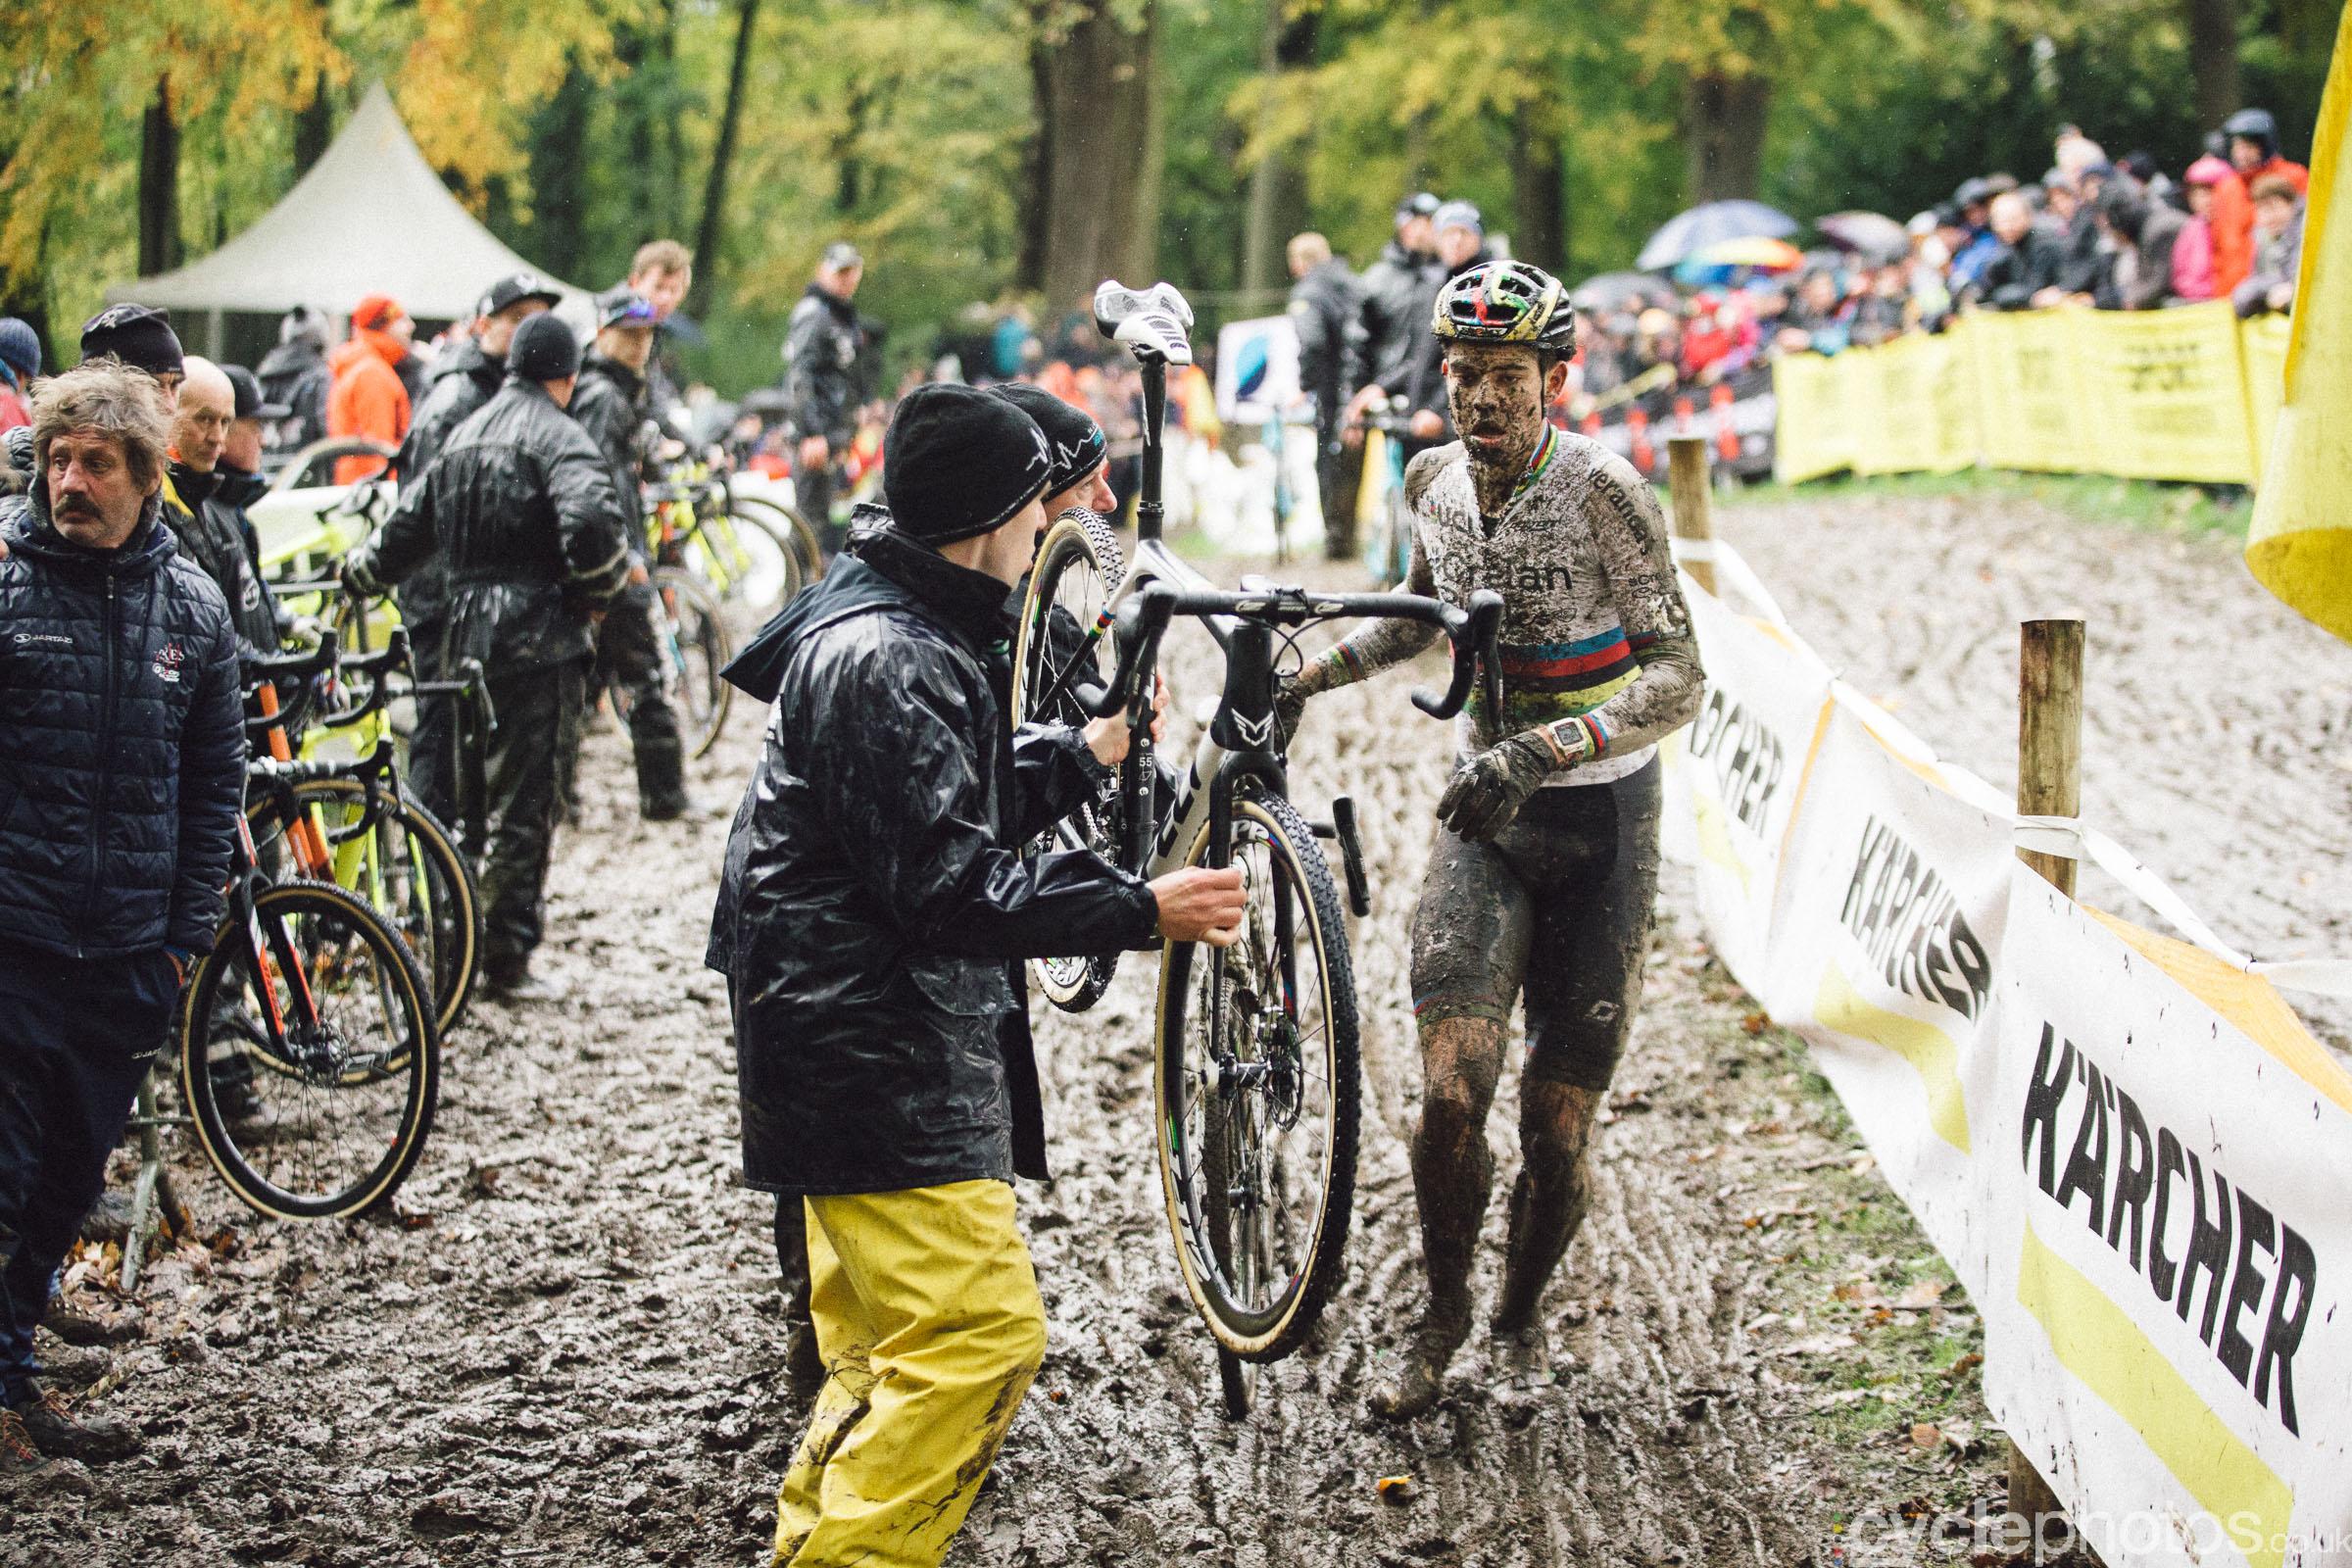 Wout Van Aert at Cyclocross Superprestige #5 - Gavere, BEL